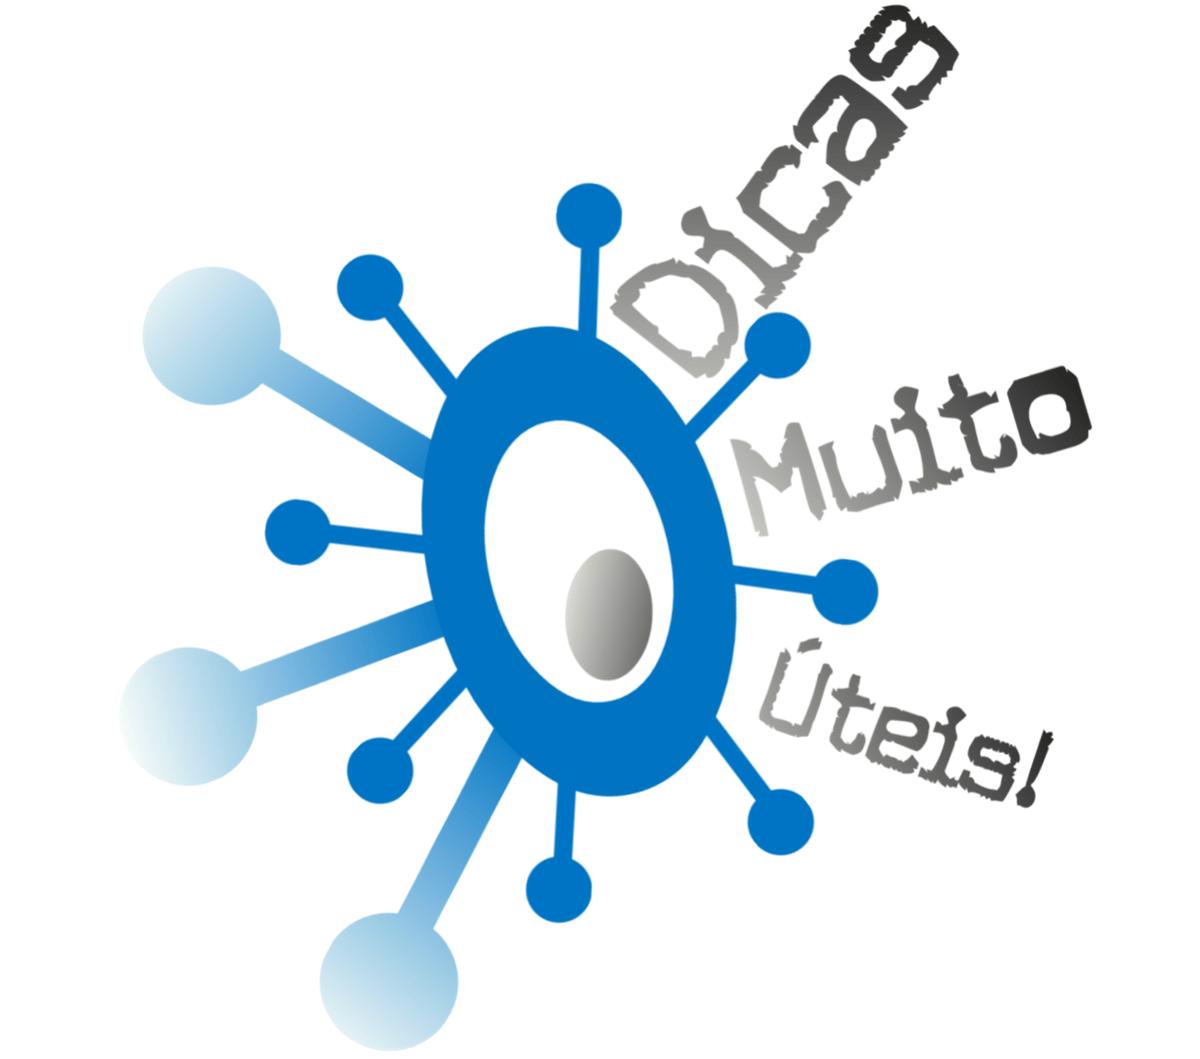 Dicas Muito Uteis!